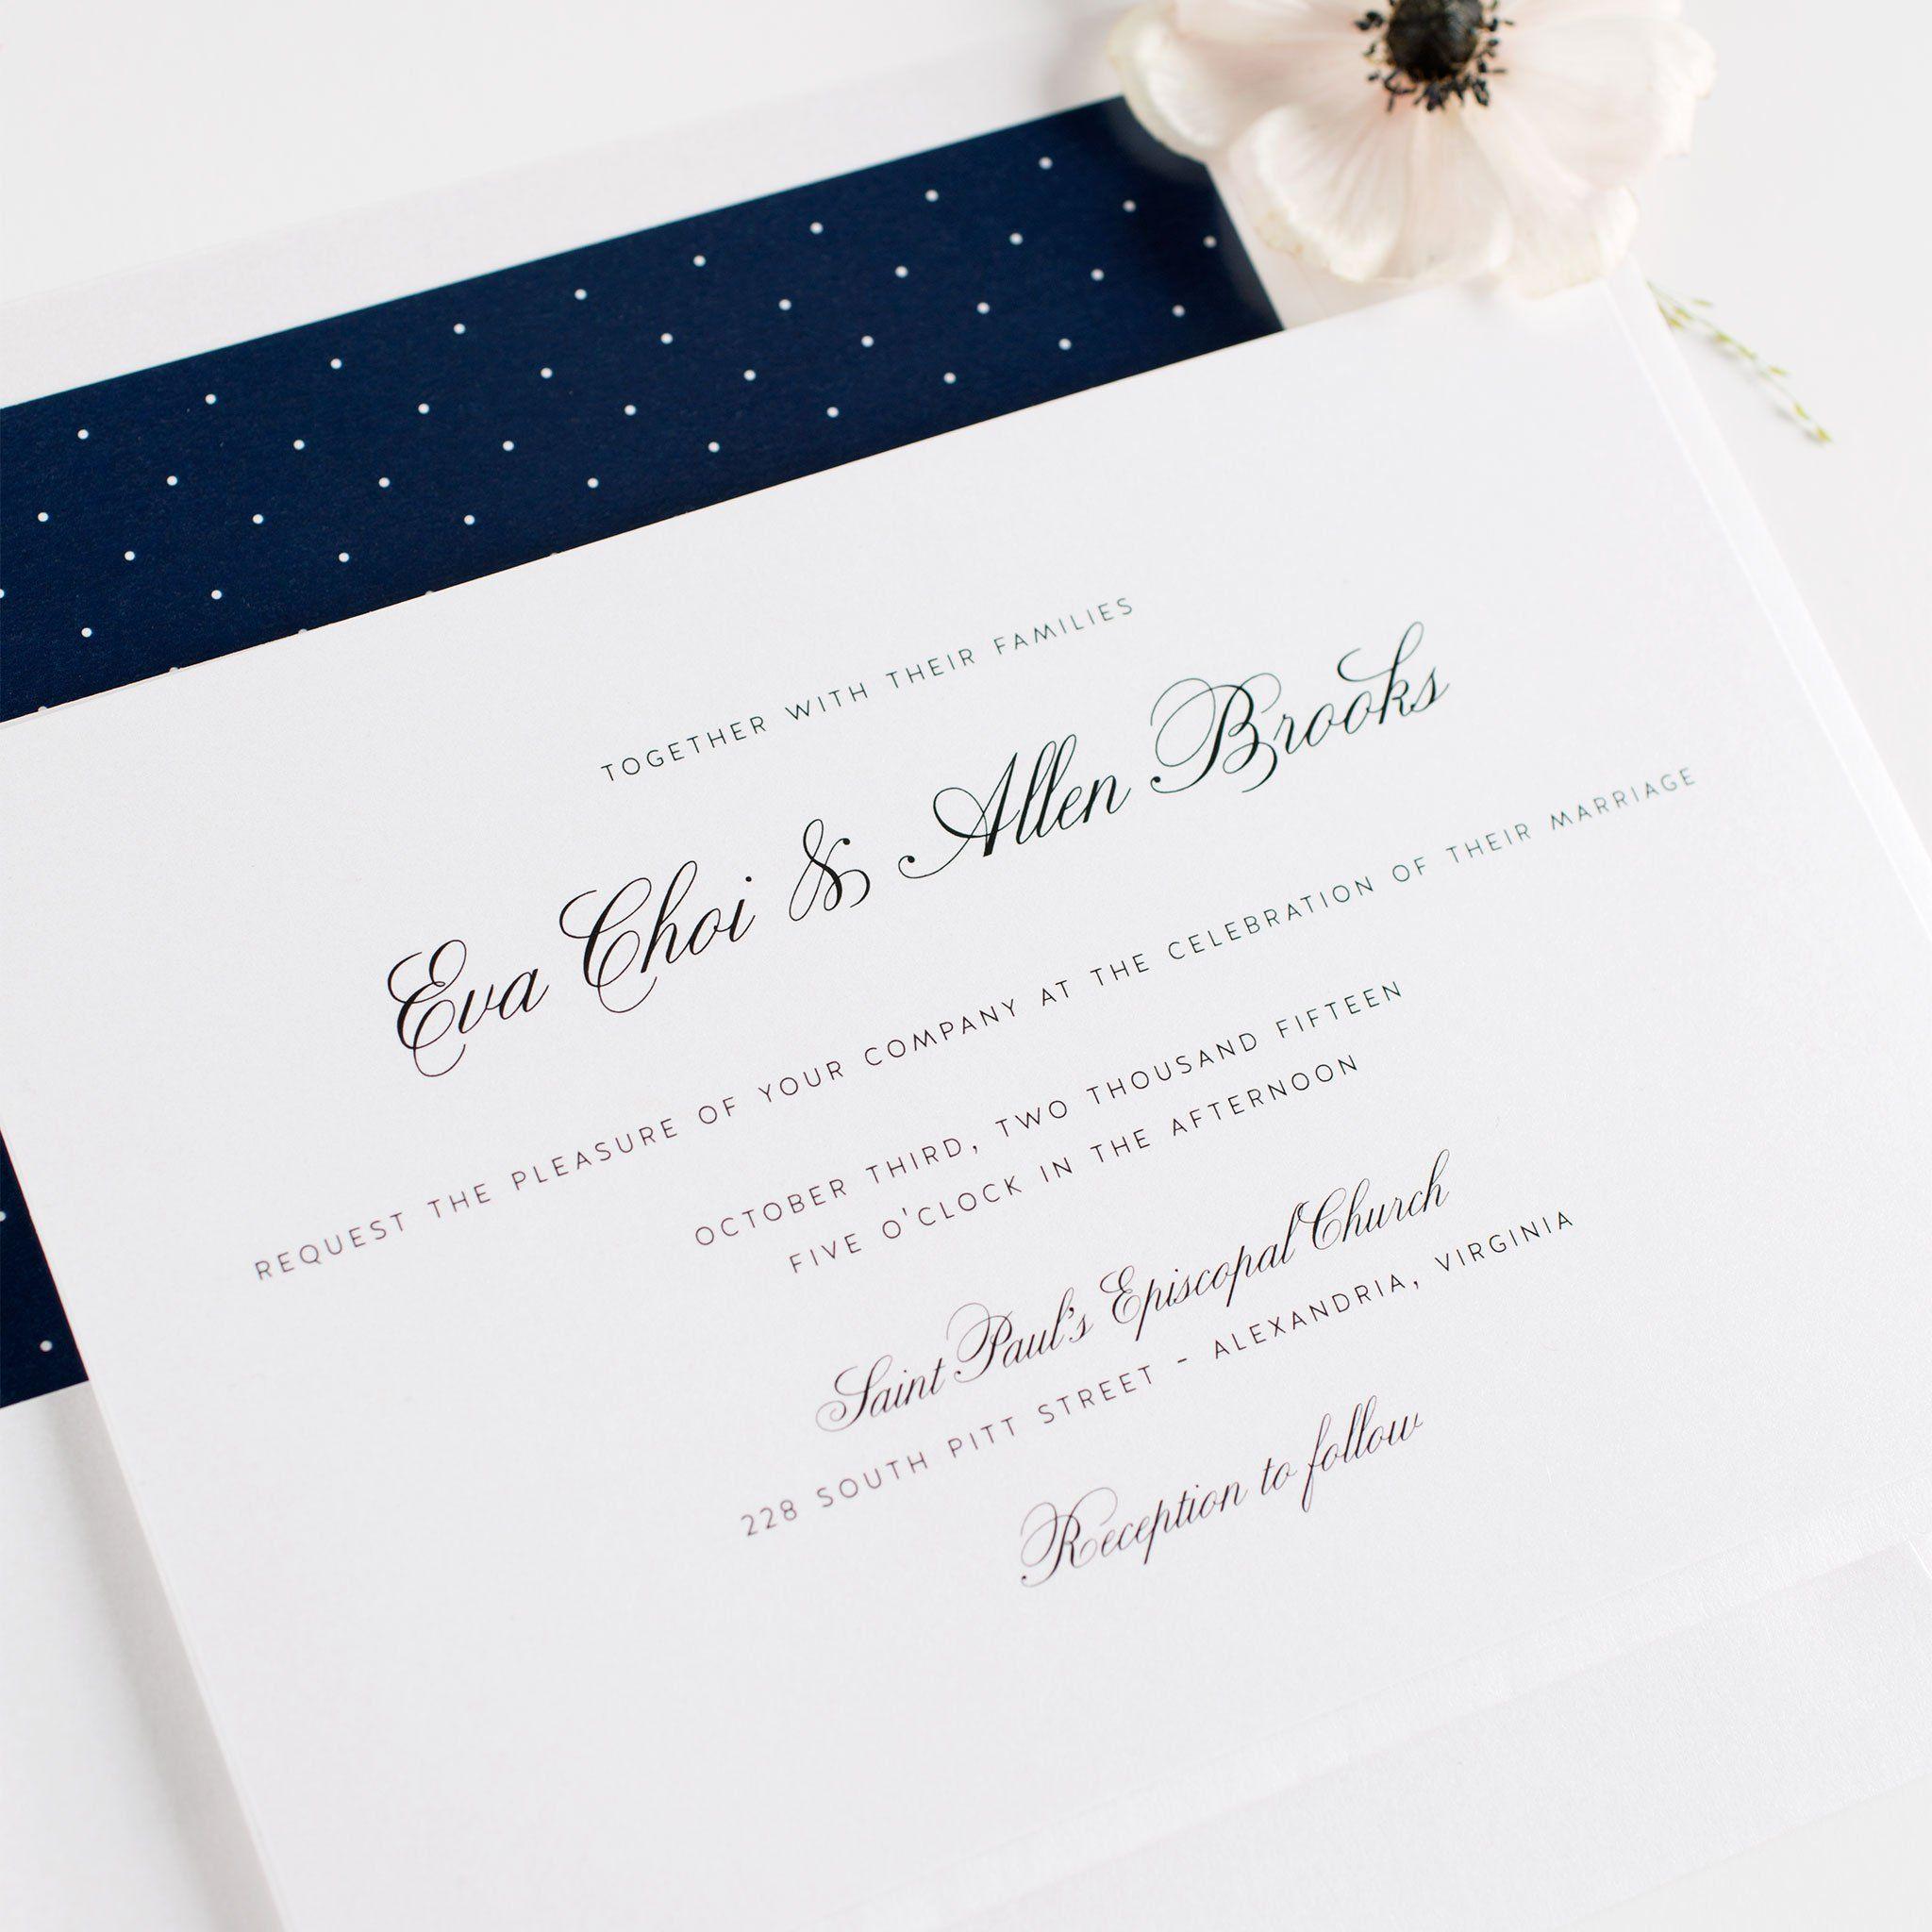 Free Wedding Invitation Samples   Shine Wedding Invitations ...